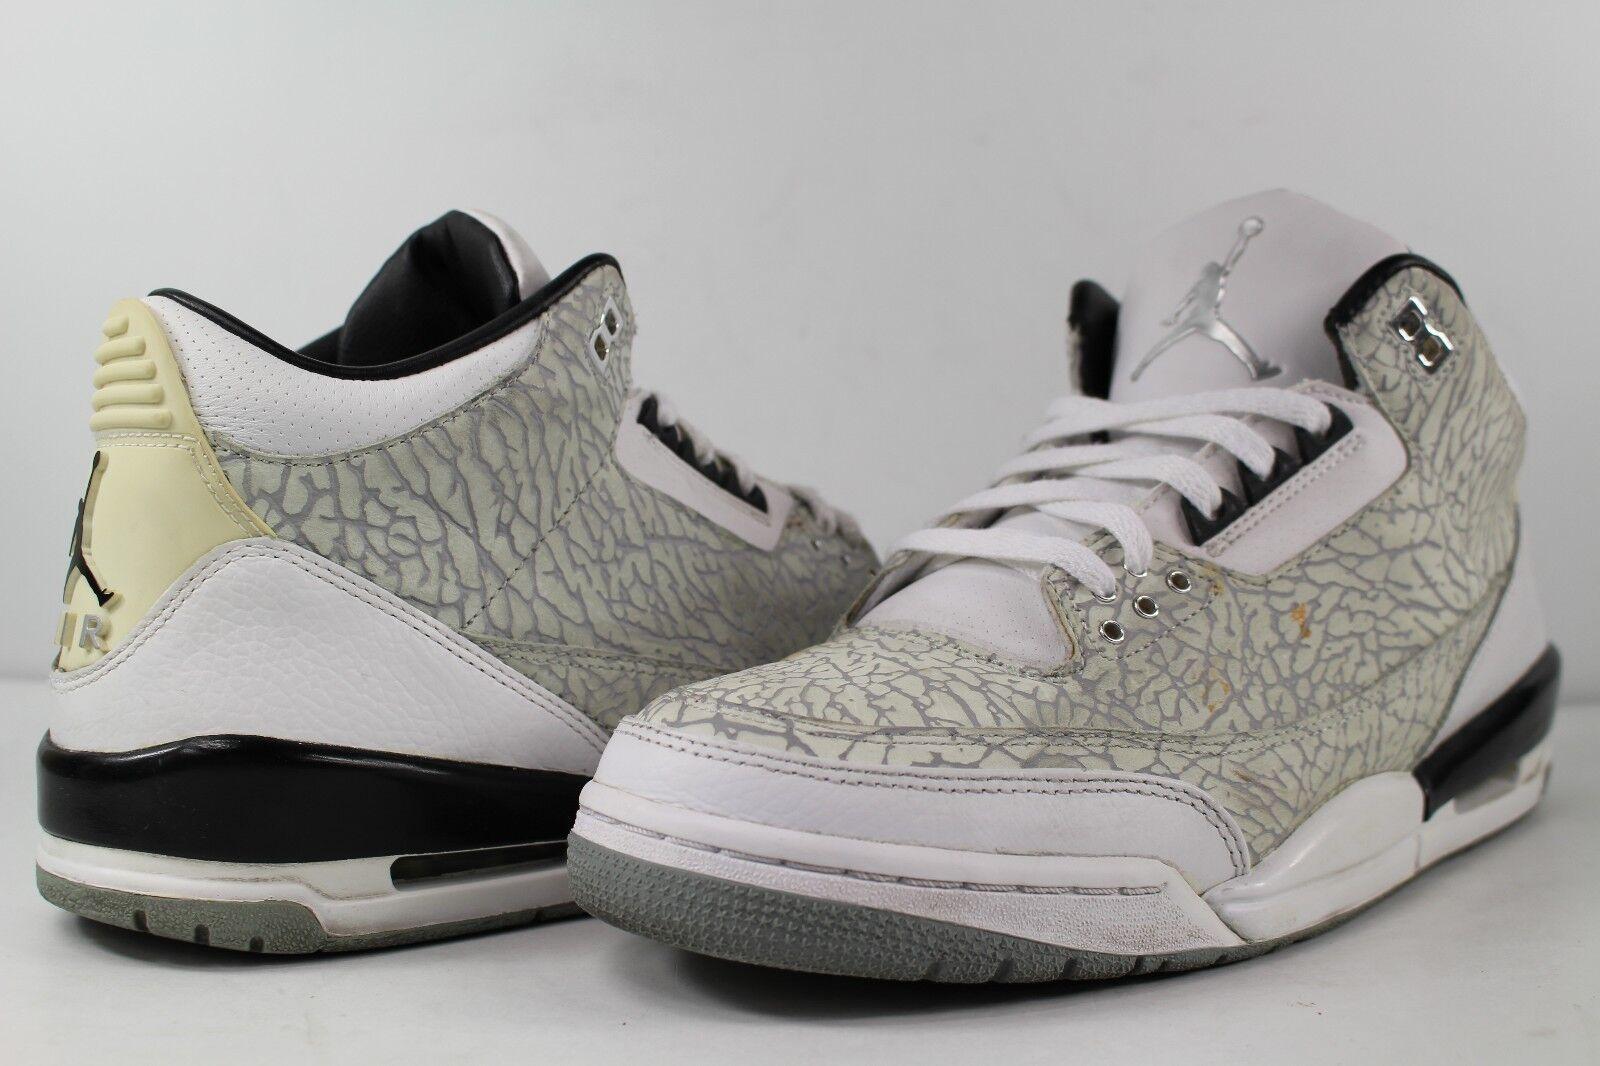 Nike Air Jordan Retro III Flip 3 White Cement Metallic Silver Black Red lot Cheap women's shoes women's shoes